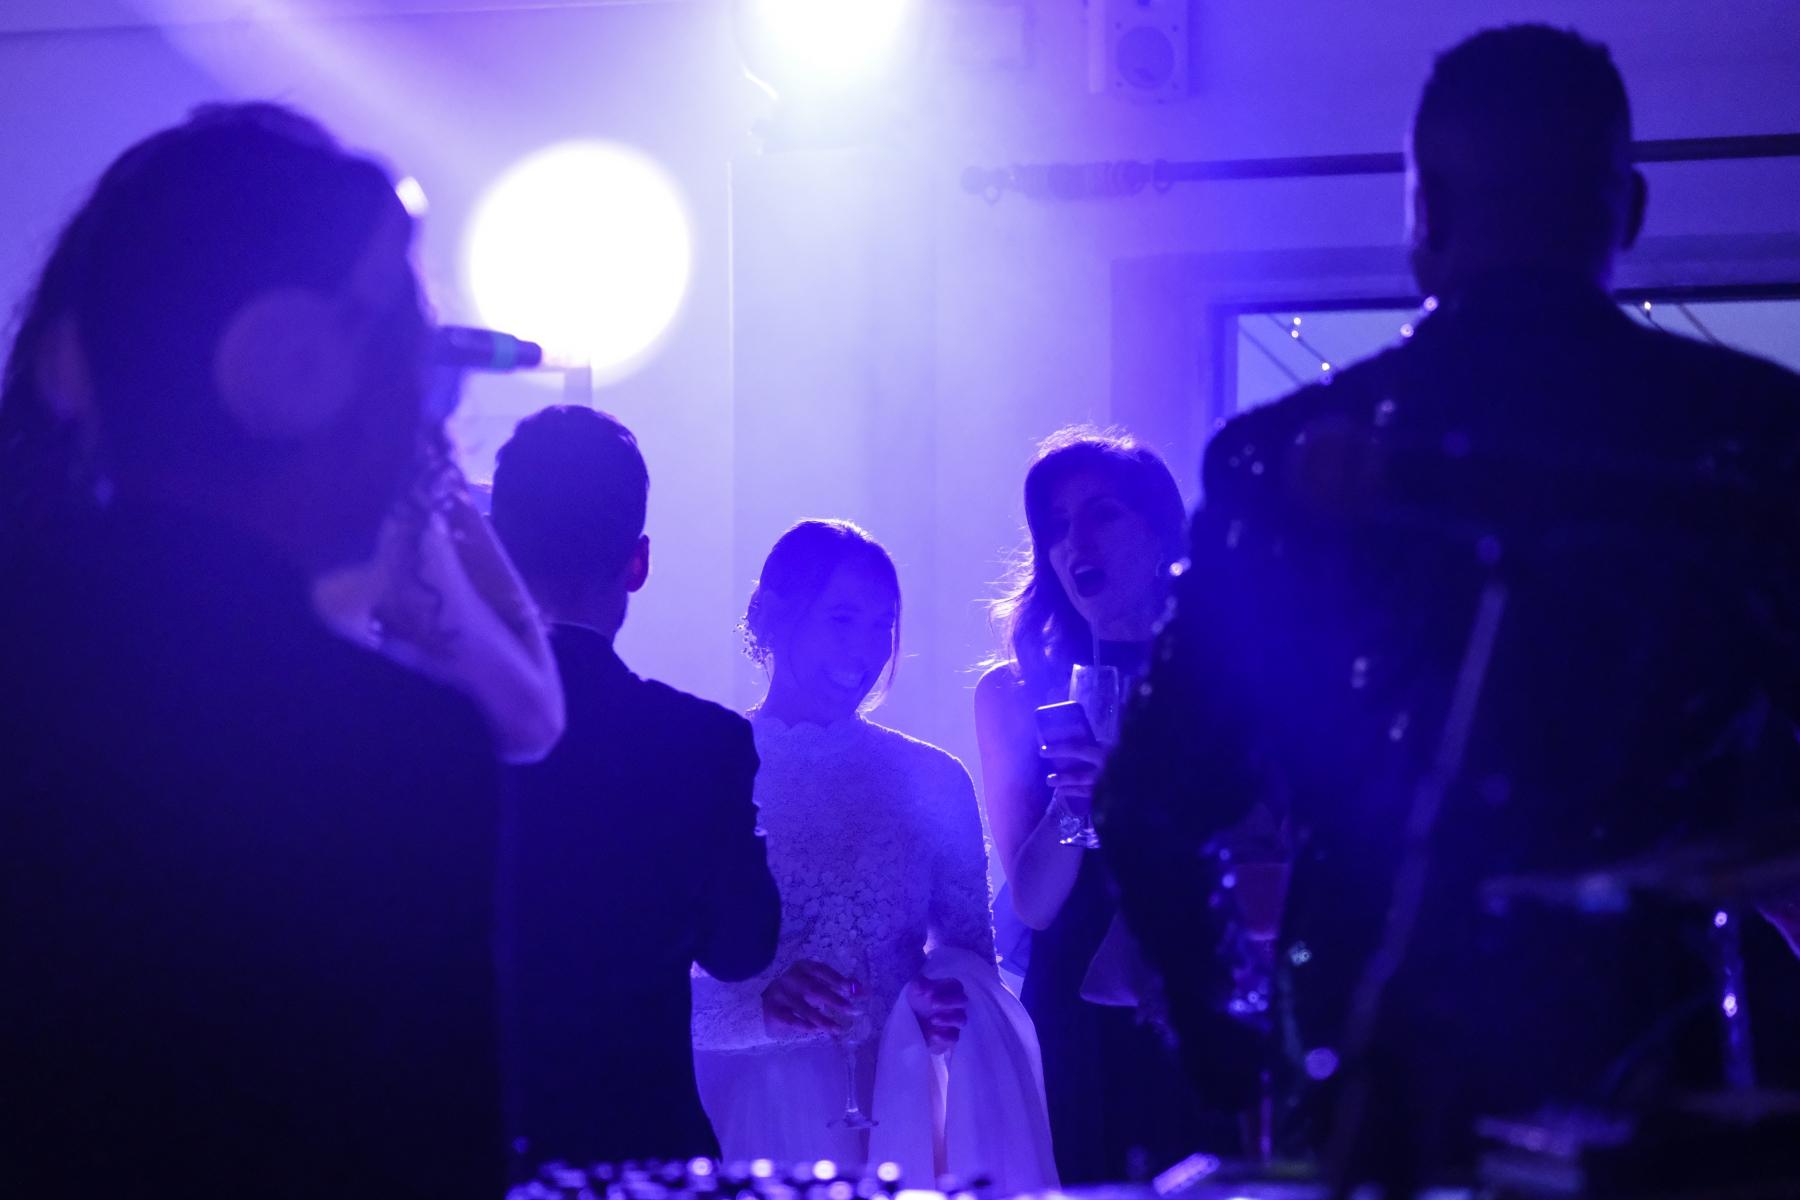 matrimoniotennisclubnapoli_blineventi-19